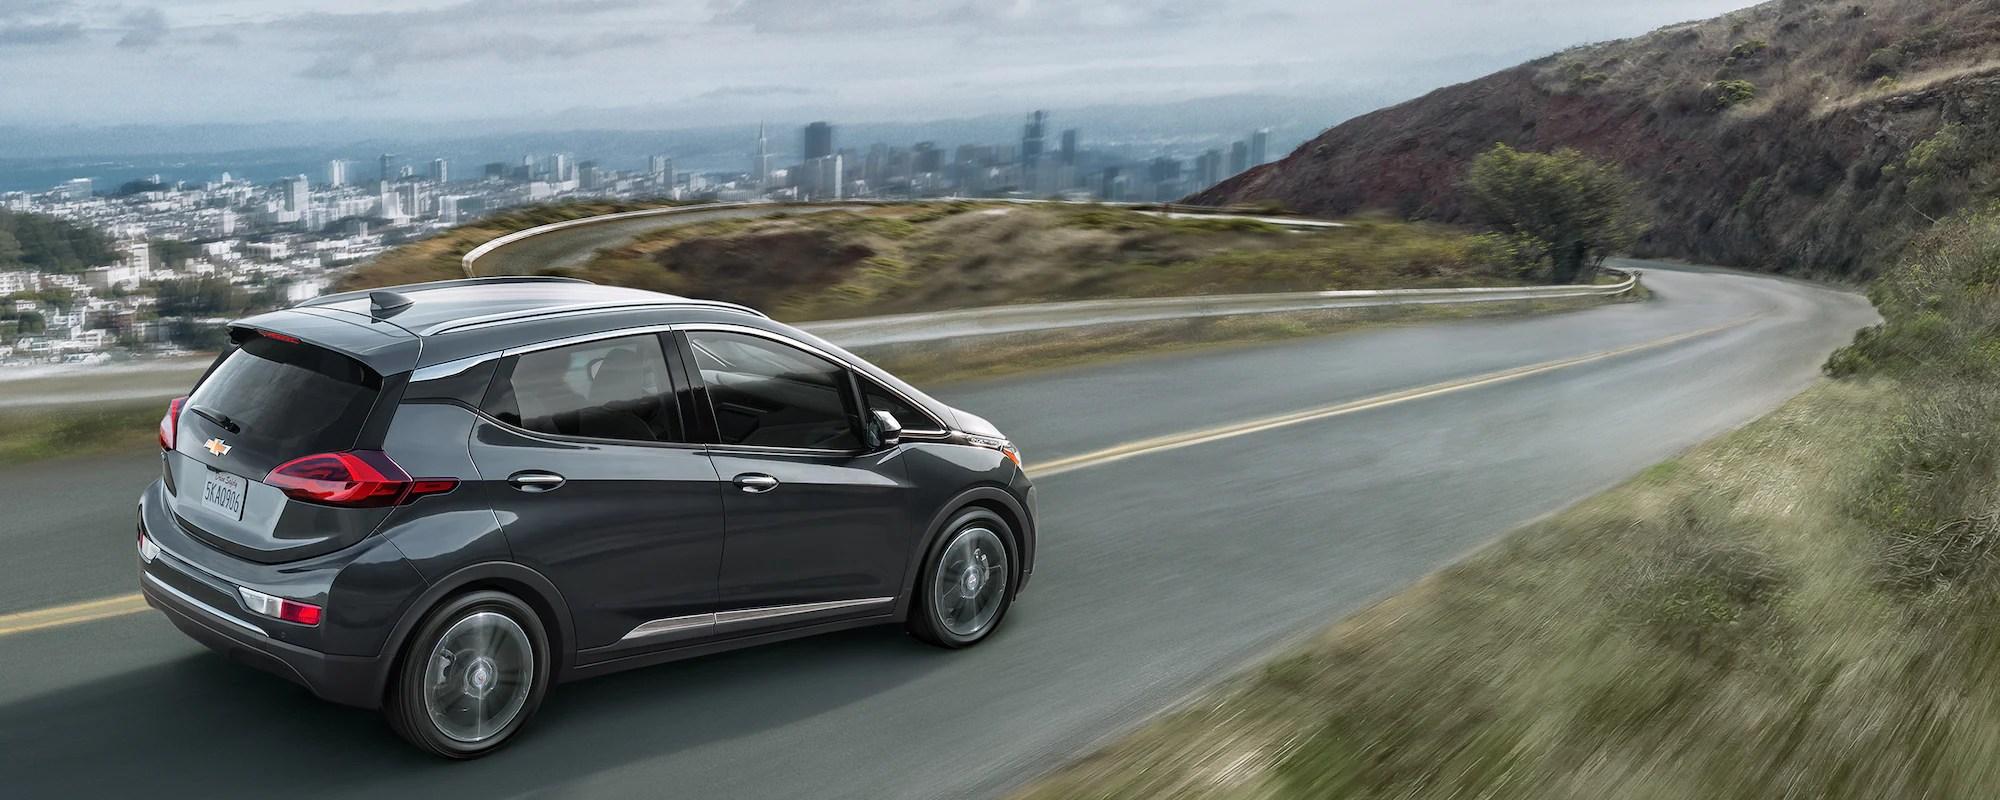 2019 bolt ev electric car an affordable all electric car evs car alarm wiring diagram 2 [ 2500 x 1000 Pixel ]